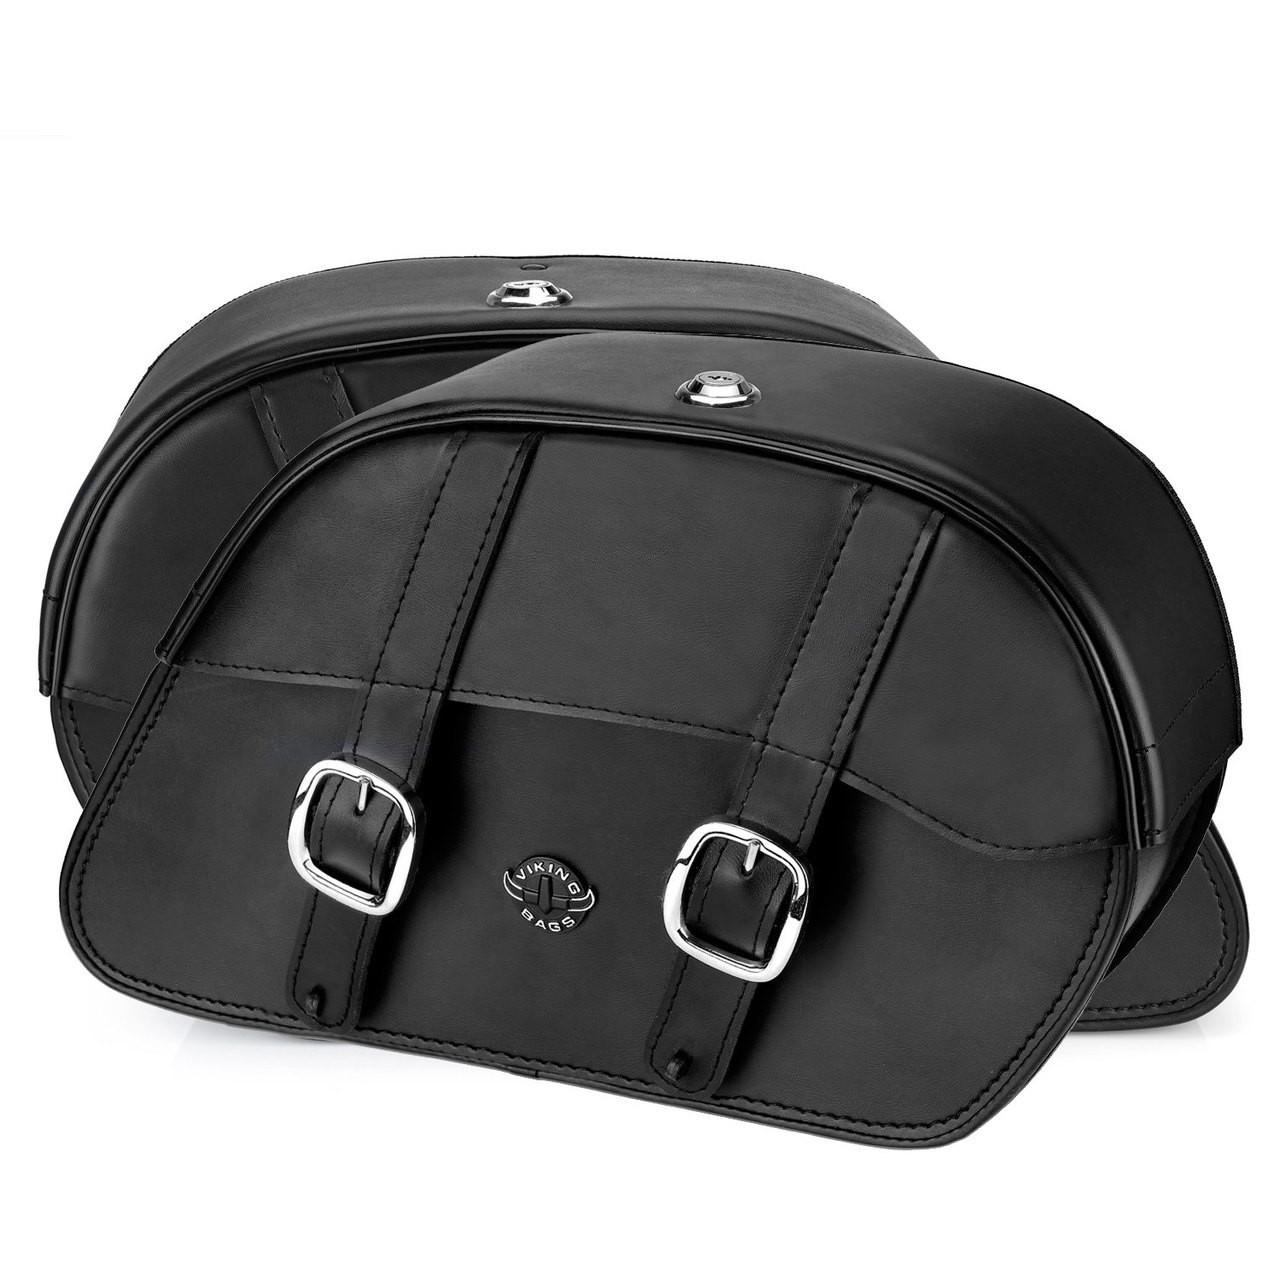 Vikingbags Shock Cutout Large Slanted Saddlebags Both Bags View